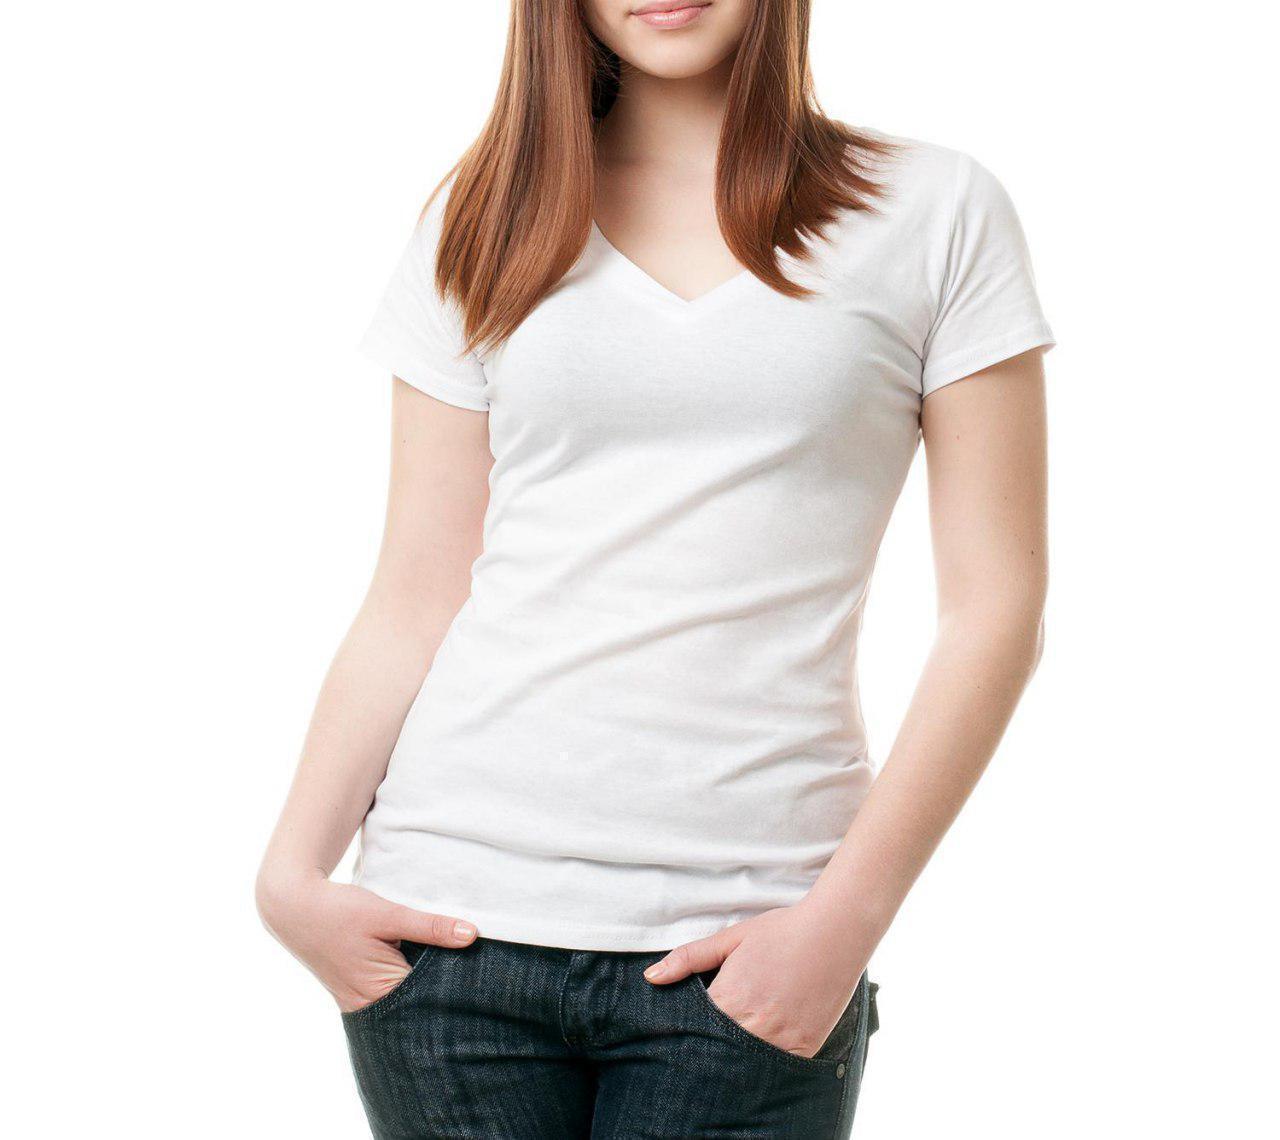 Женская футболка джерси V-вырез размер 3XL